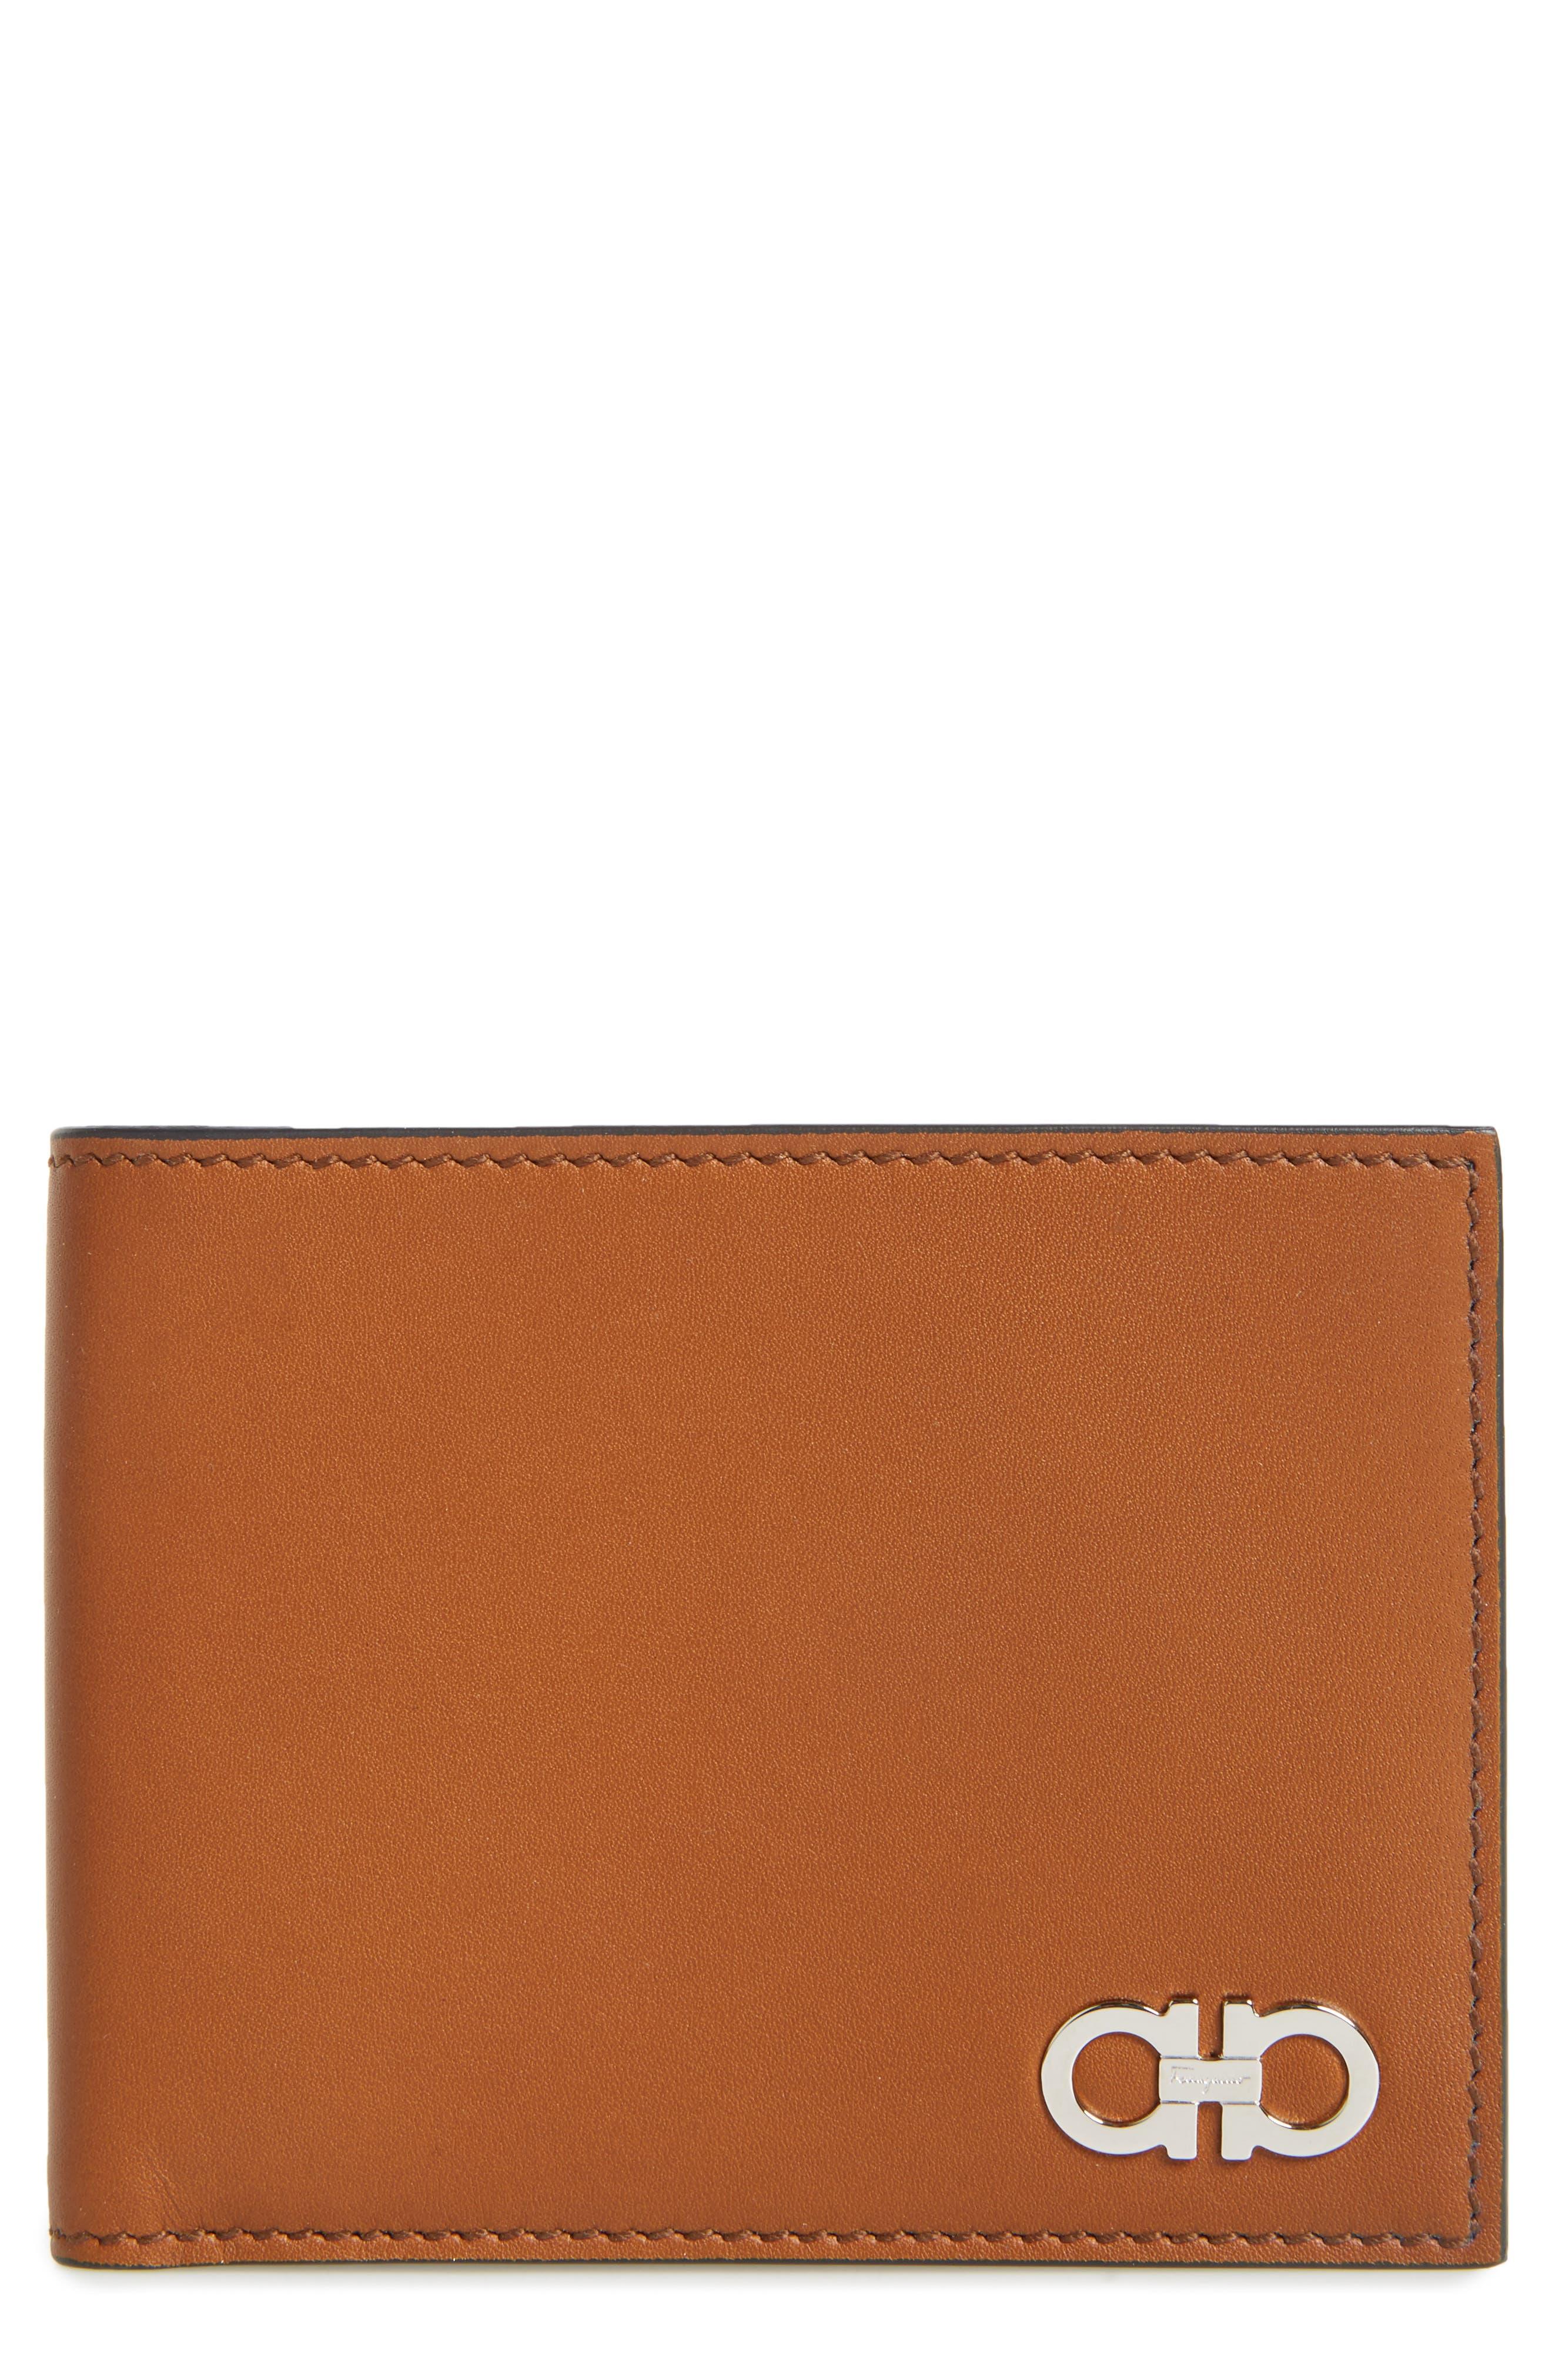 Calfskin Leather Bifold Wallet,                             Main thumbnail 1, color,                             Radica